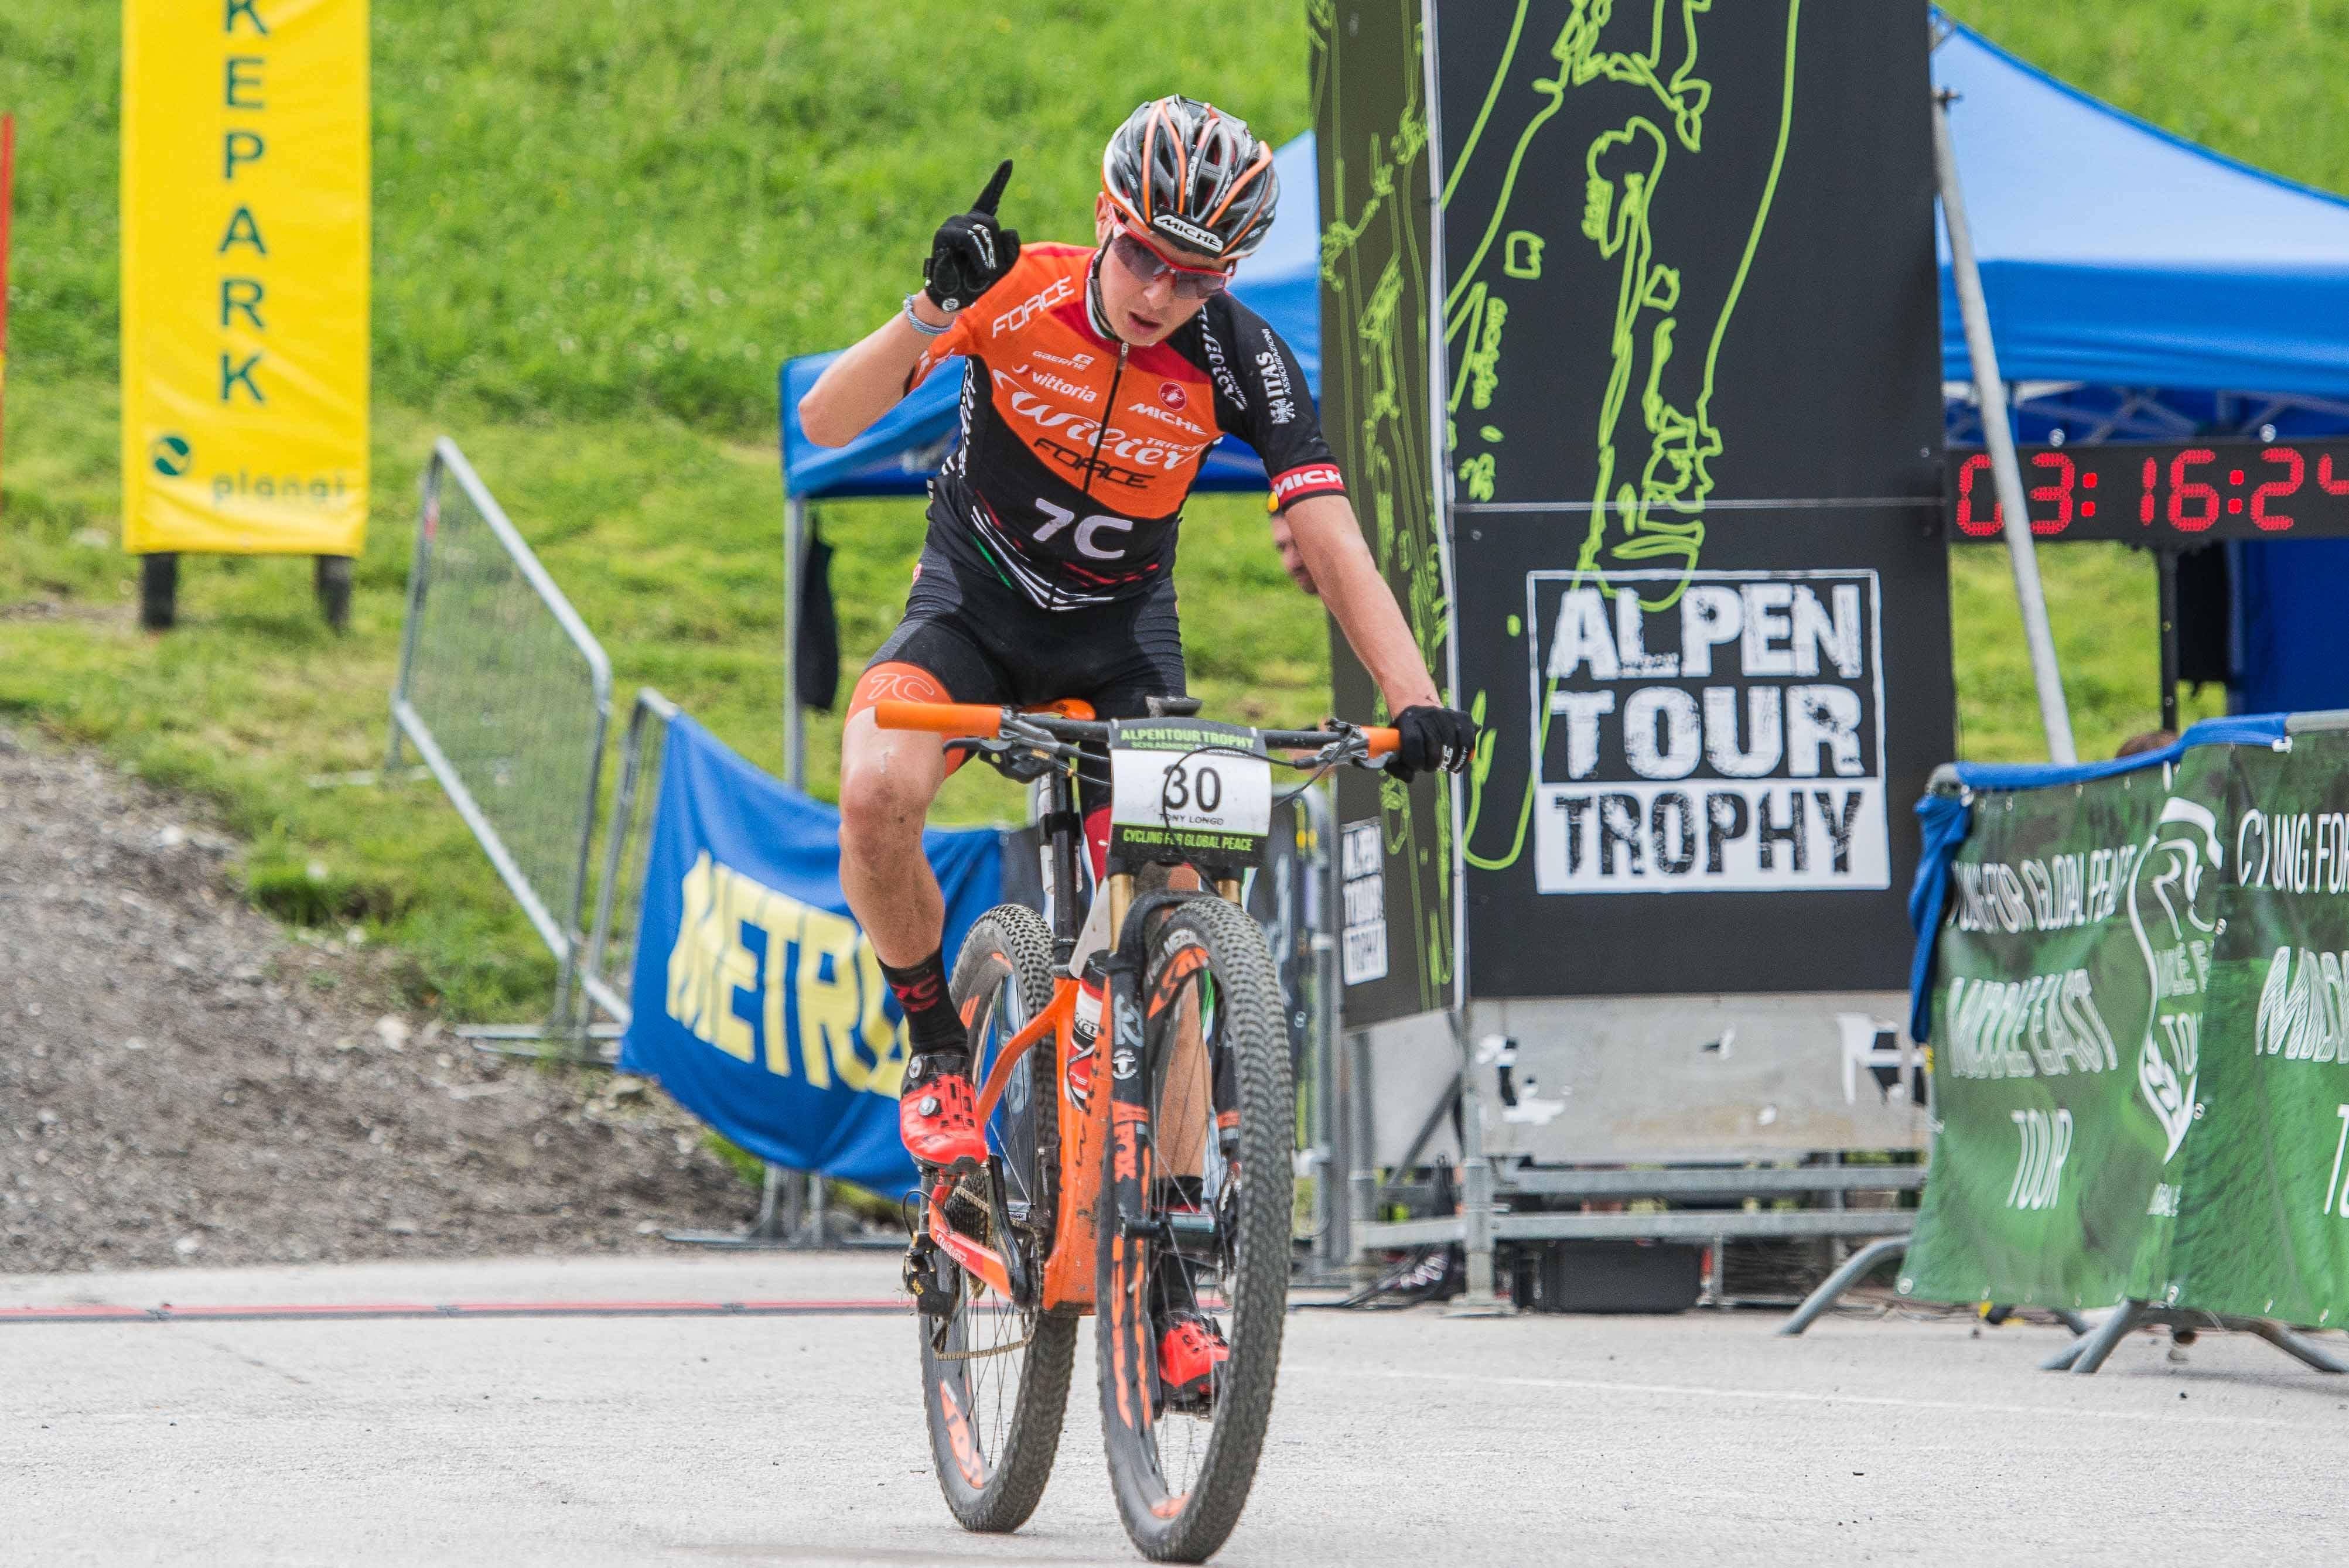 Tony Longo en Christina Kollman-Forster winnen eerste rit Alpentour Trophy